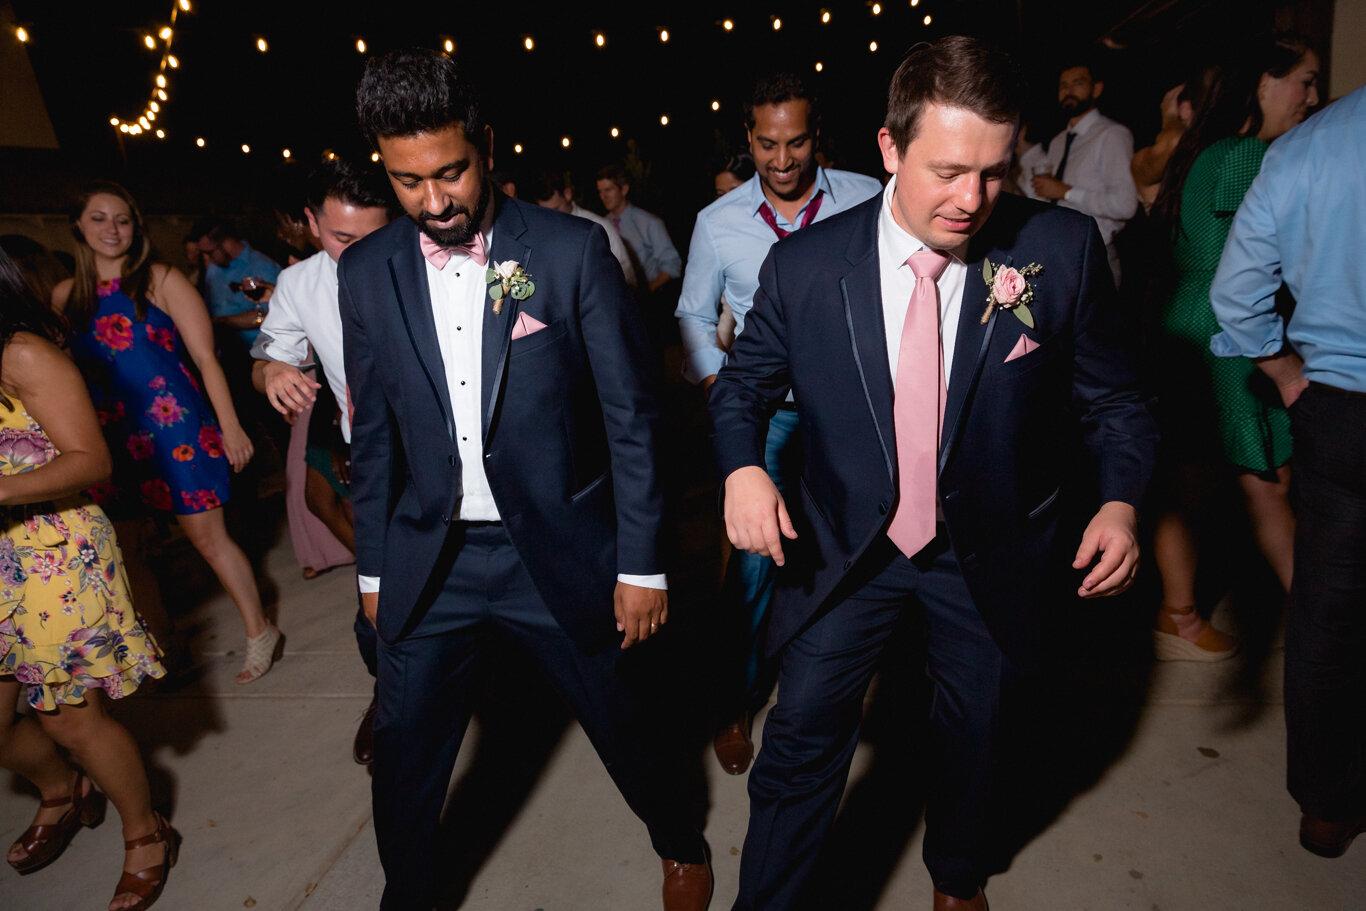 2019.08.24_Emily-Ashir-Wedding-at-the-Maples-6534.jpg